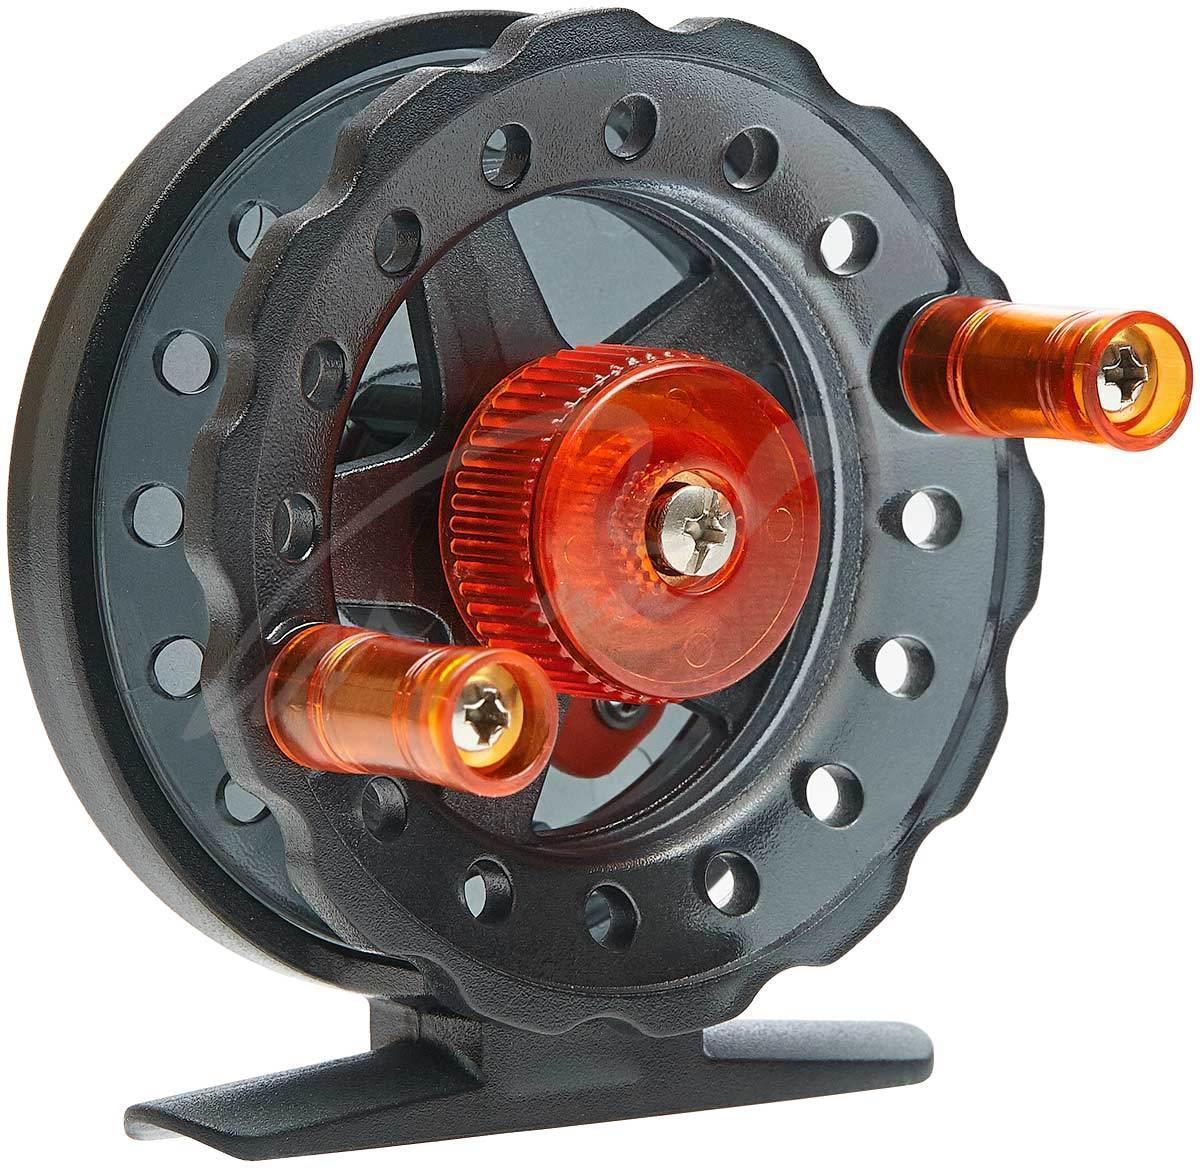 Катушка Select ICE-1 диаметр 65mm ц:черный